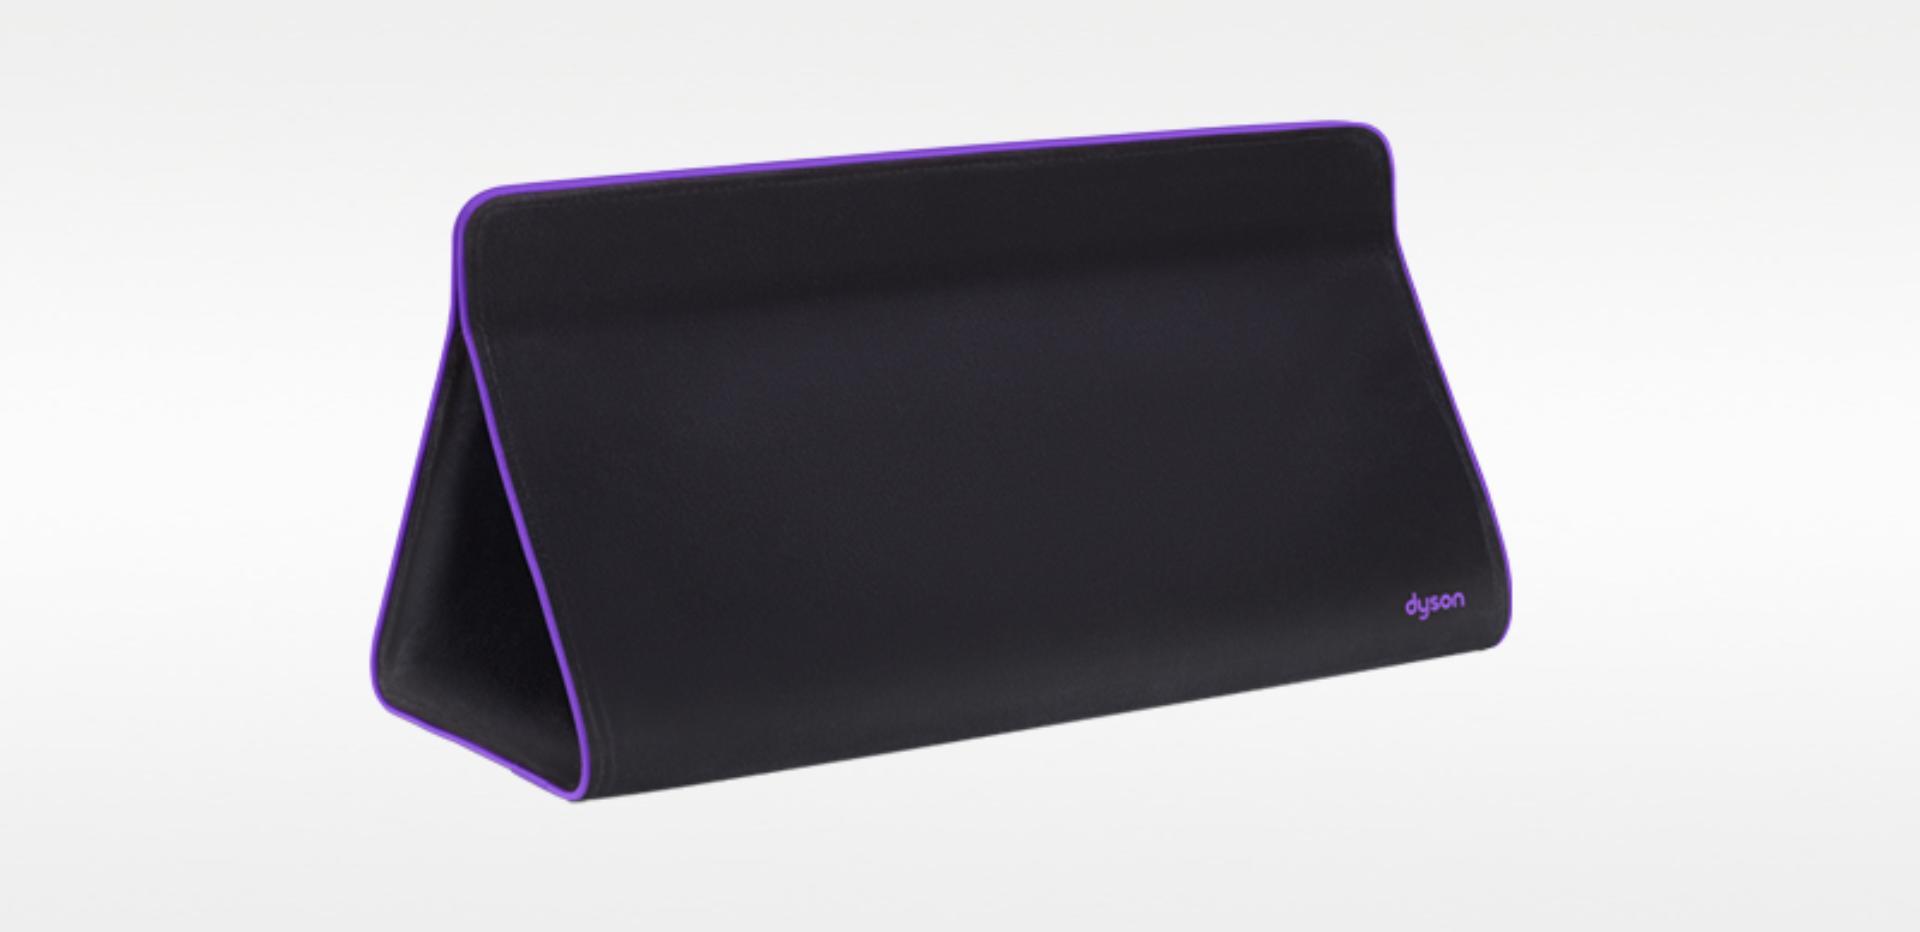 Black and purple Dyson-designed storage bag